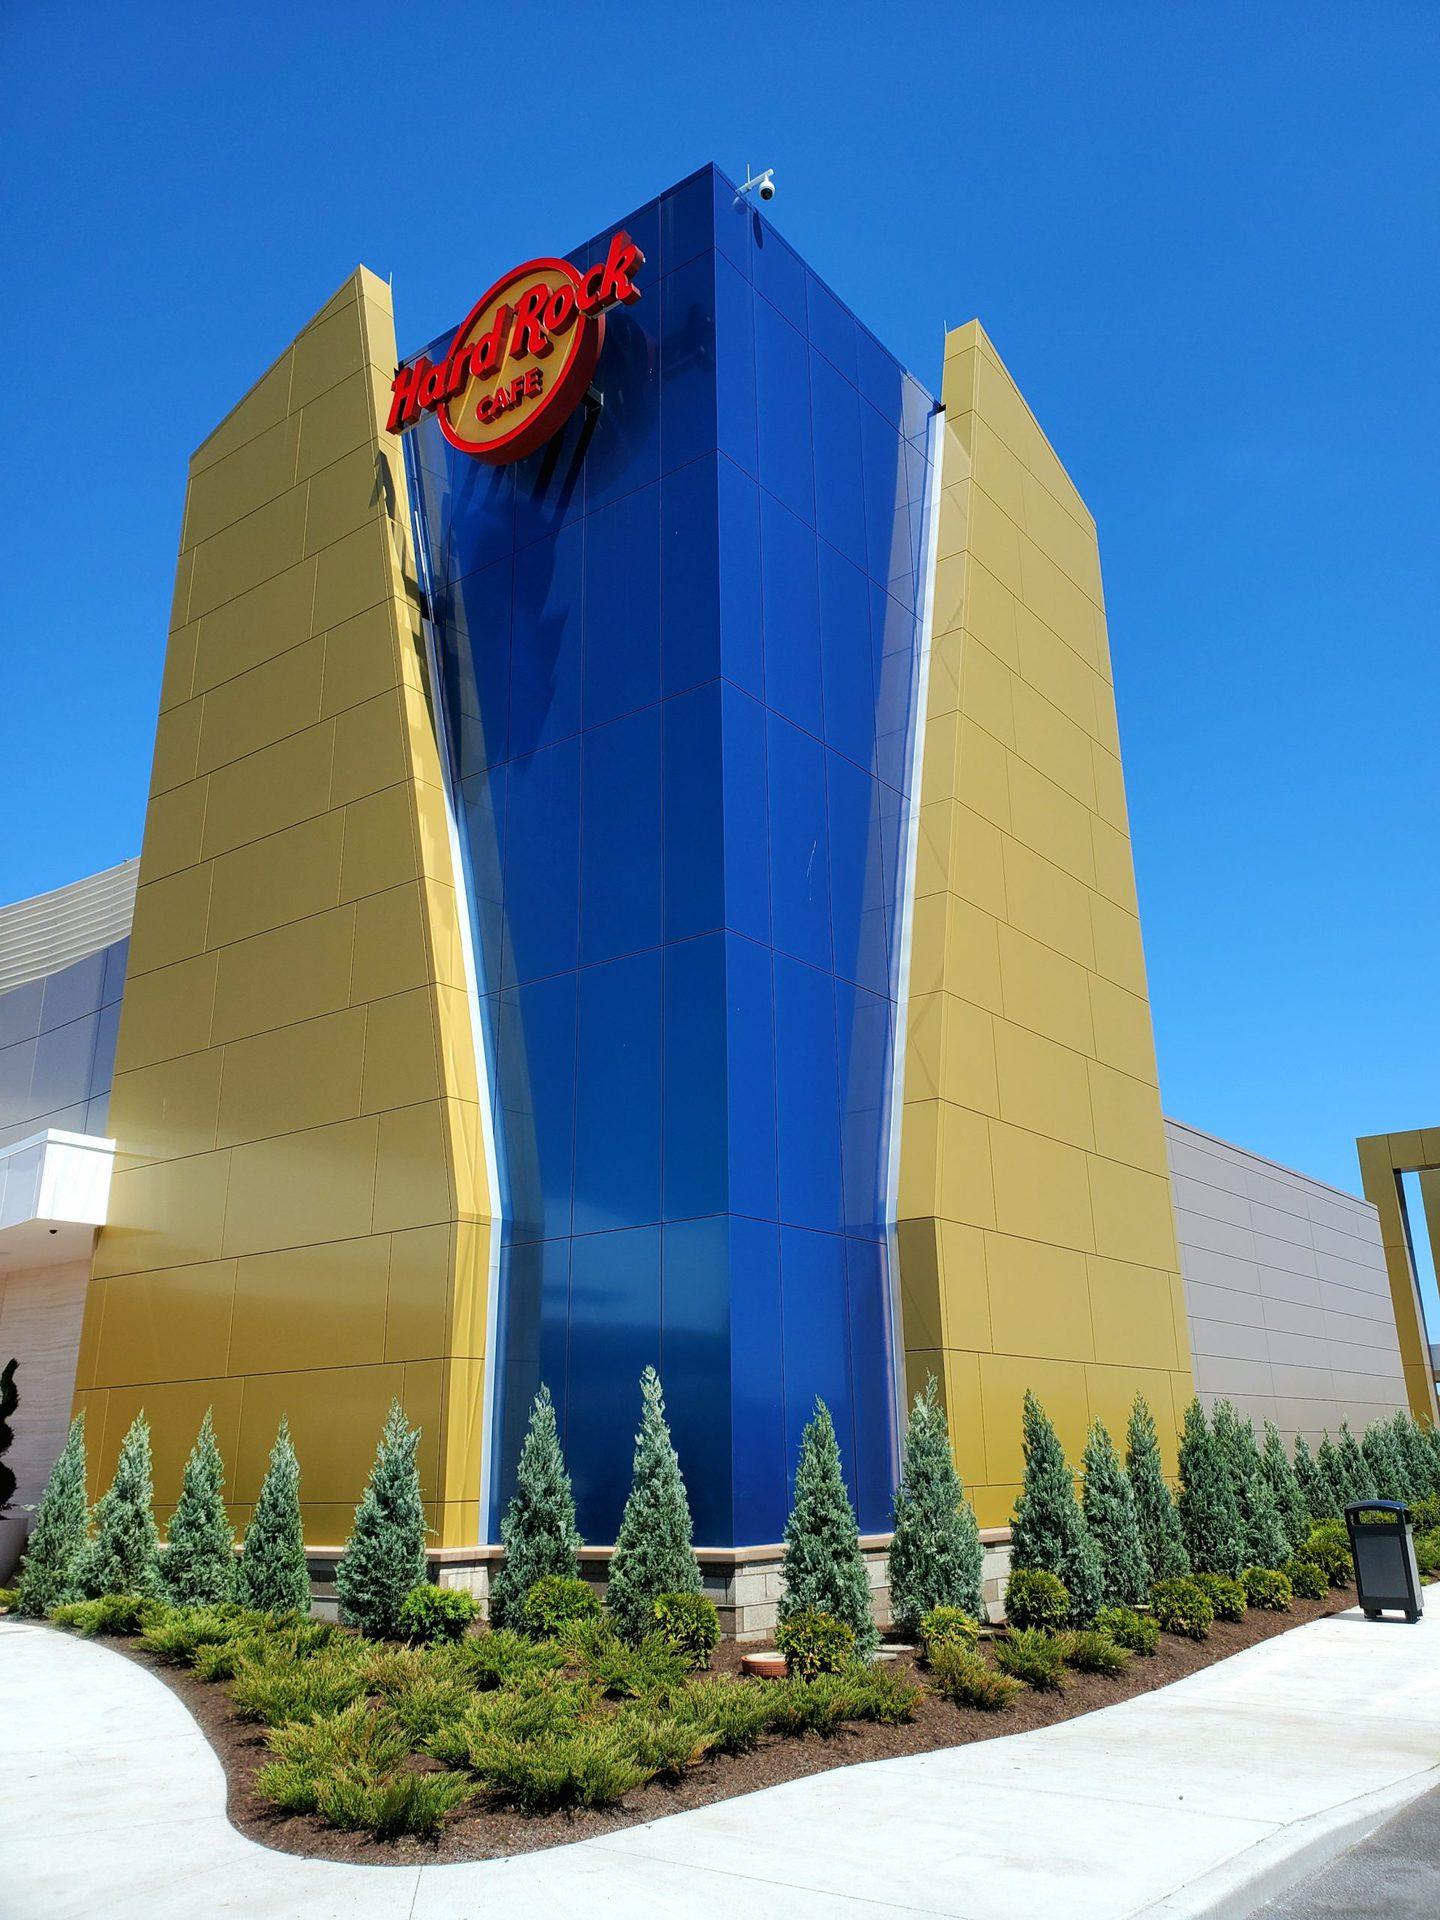 Hard Rock Casino Northern Indiana